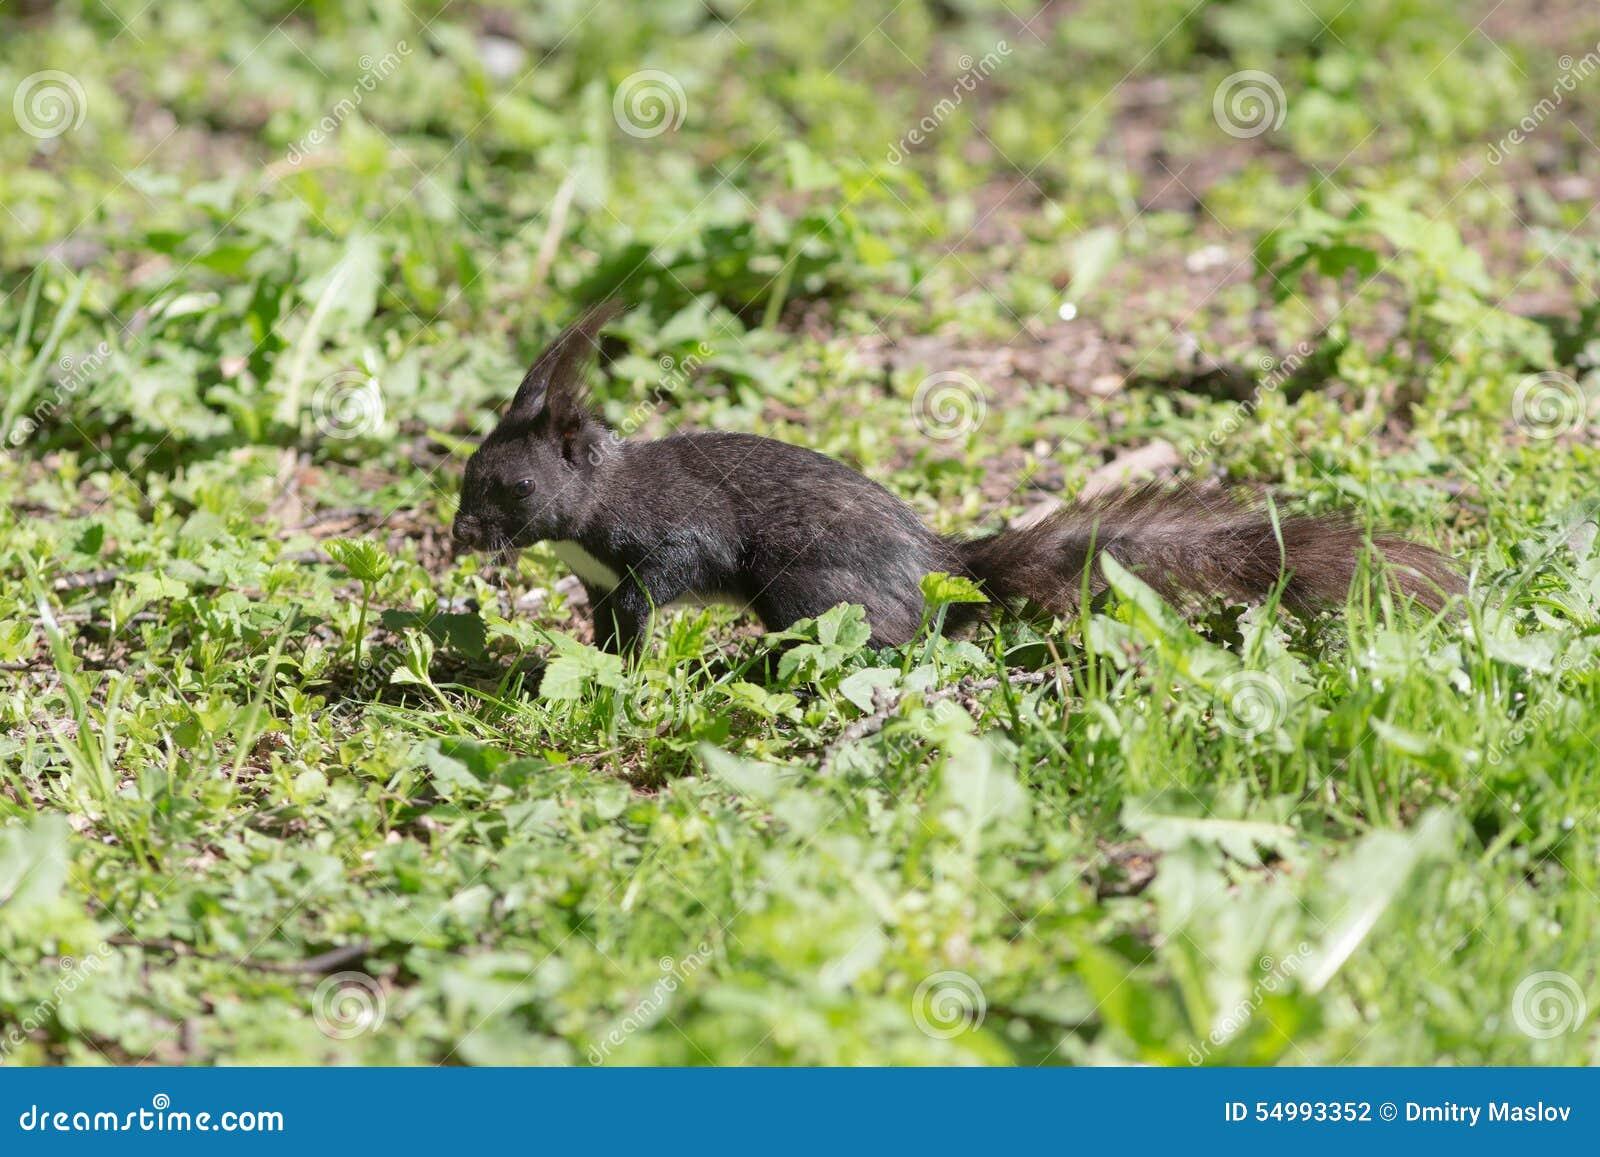 Squirrel with dark fur